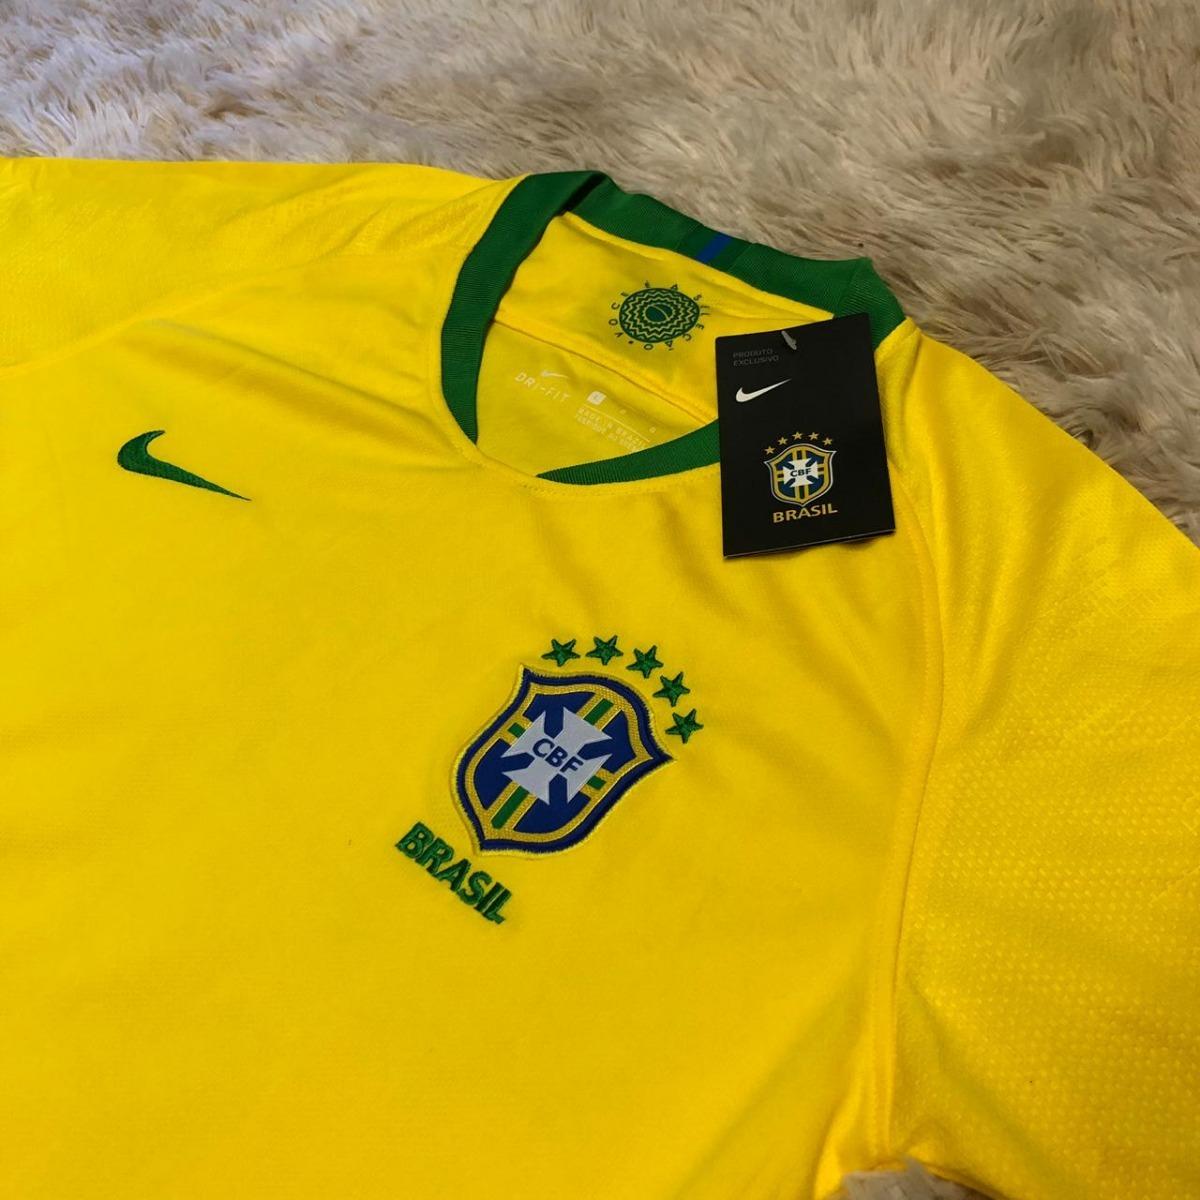 94c7d62d02863 camisa oficial do brasil feminina 2018 copa muito barato. Carregando zoom.